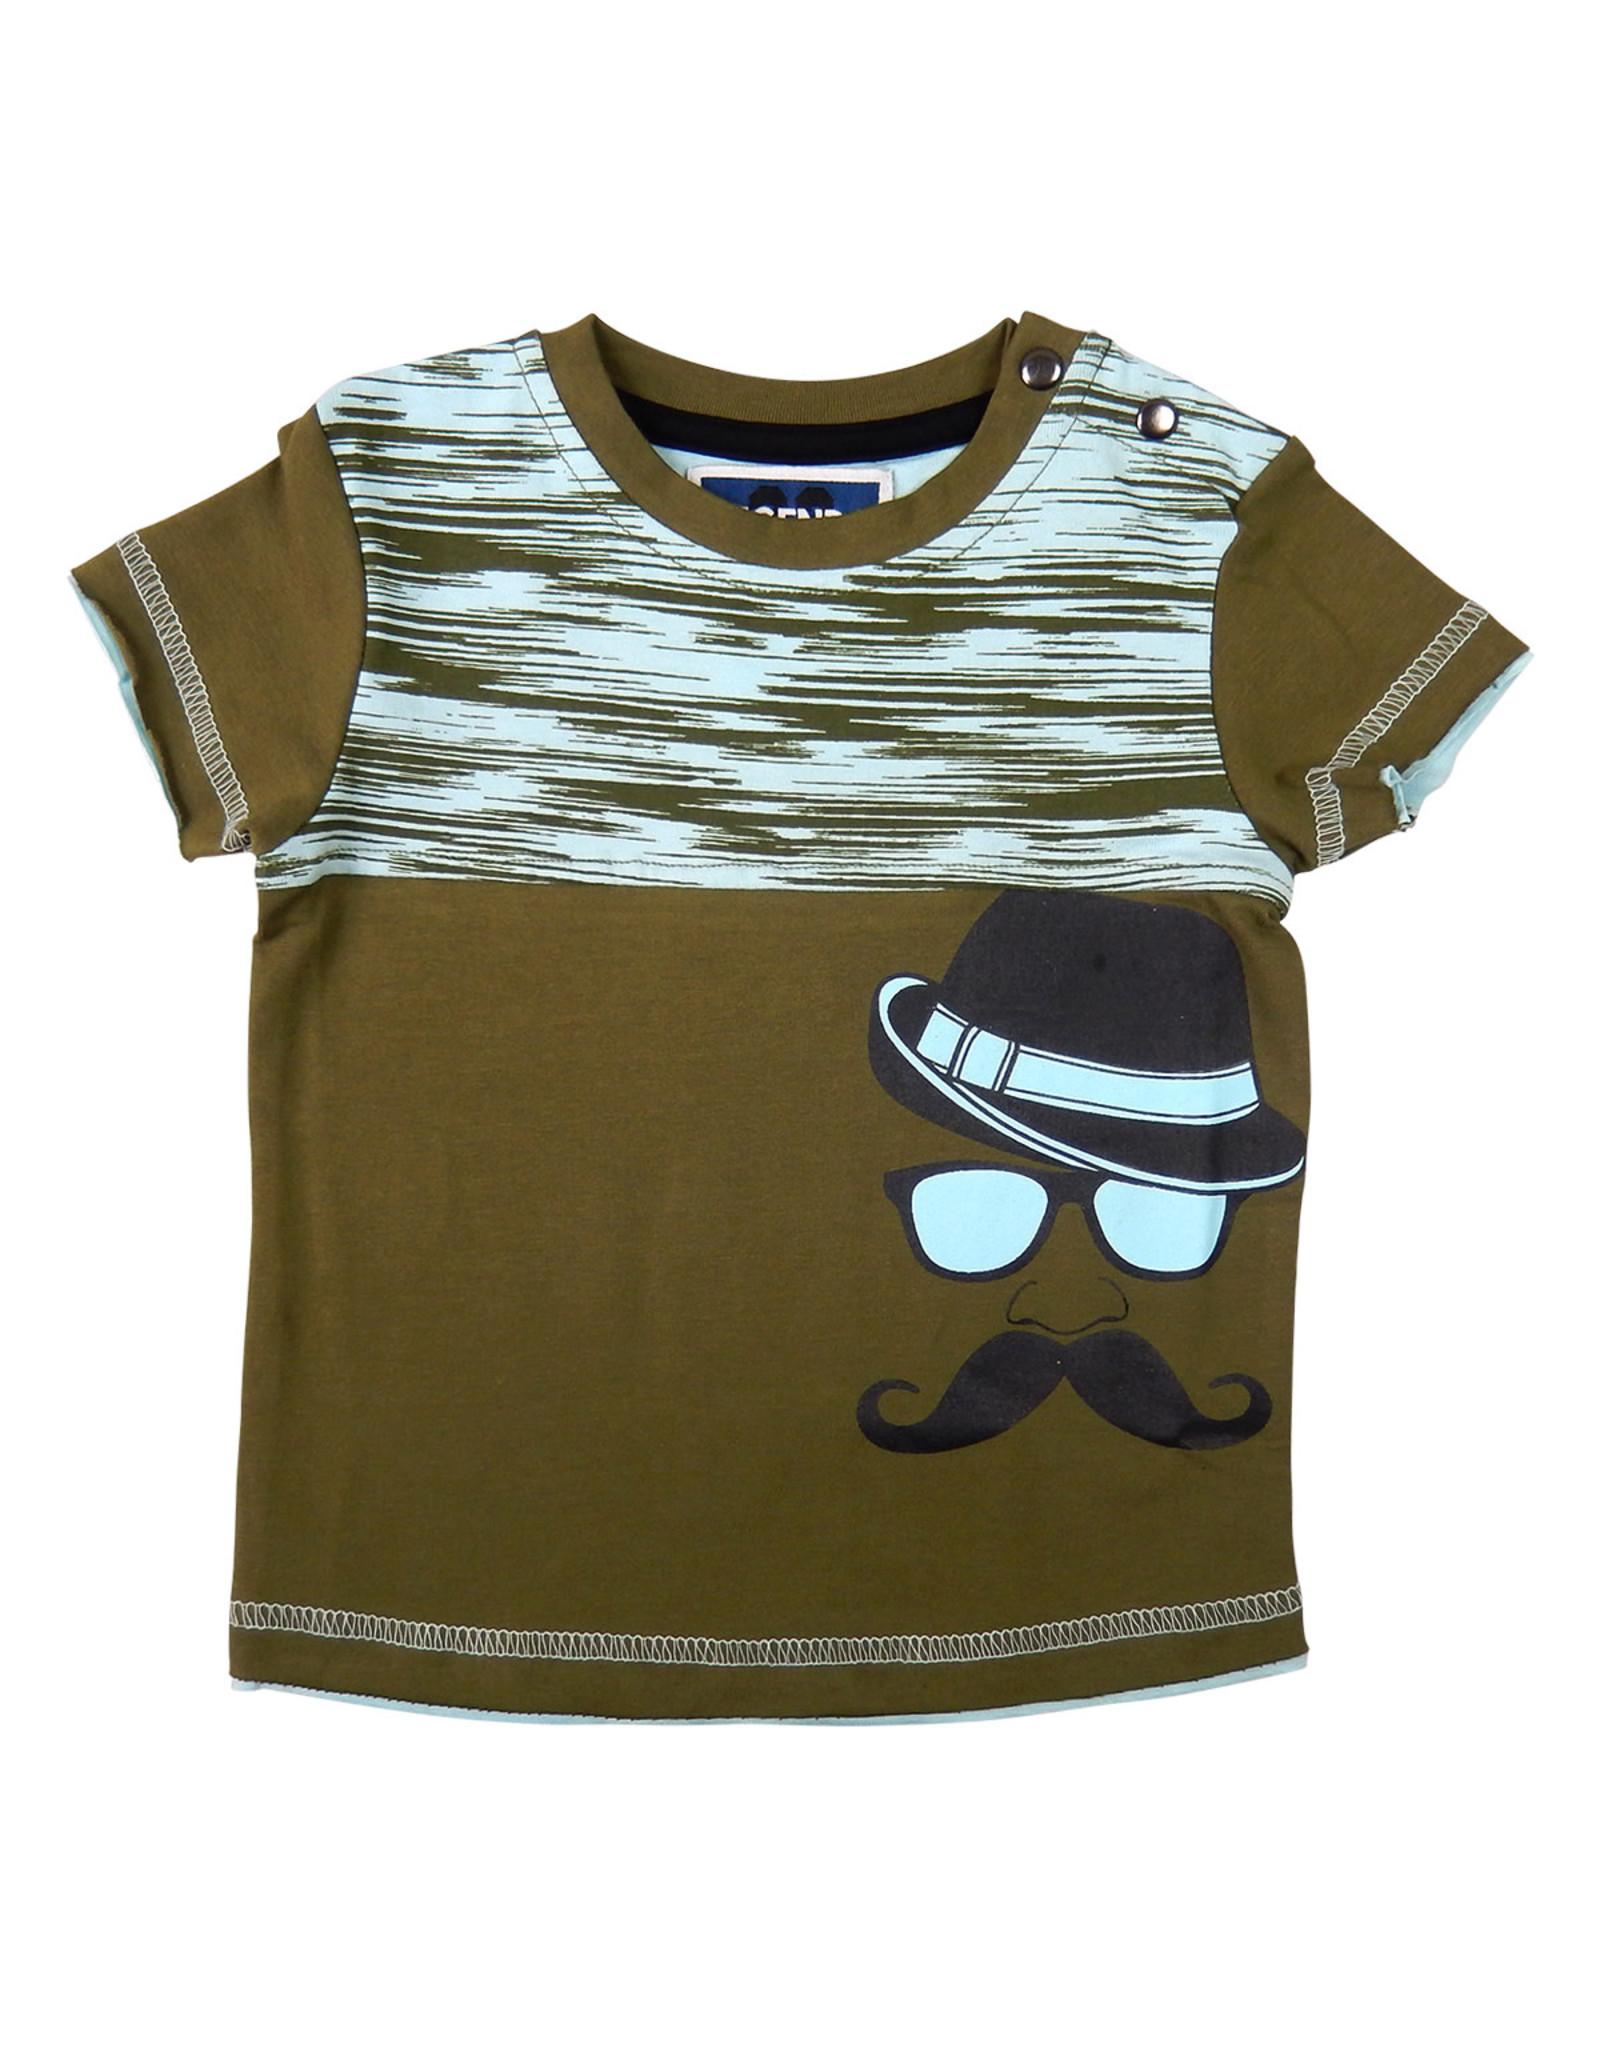 Legends baby jongens t-shirt Mr Moustache